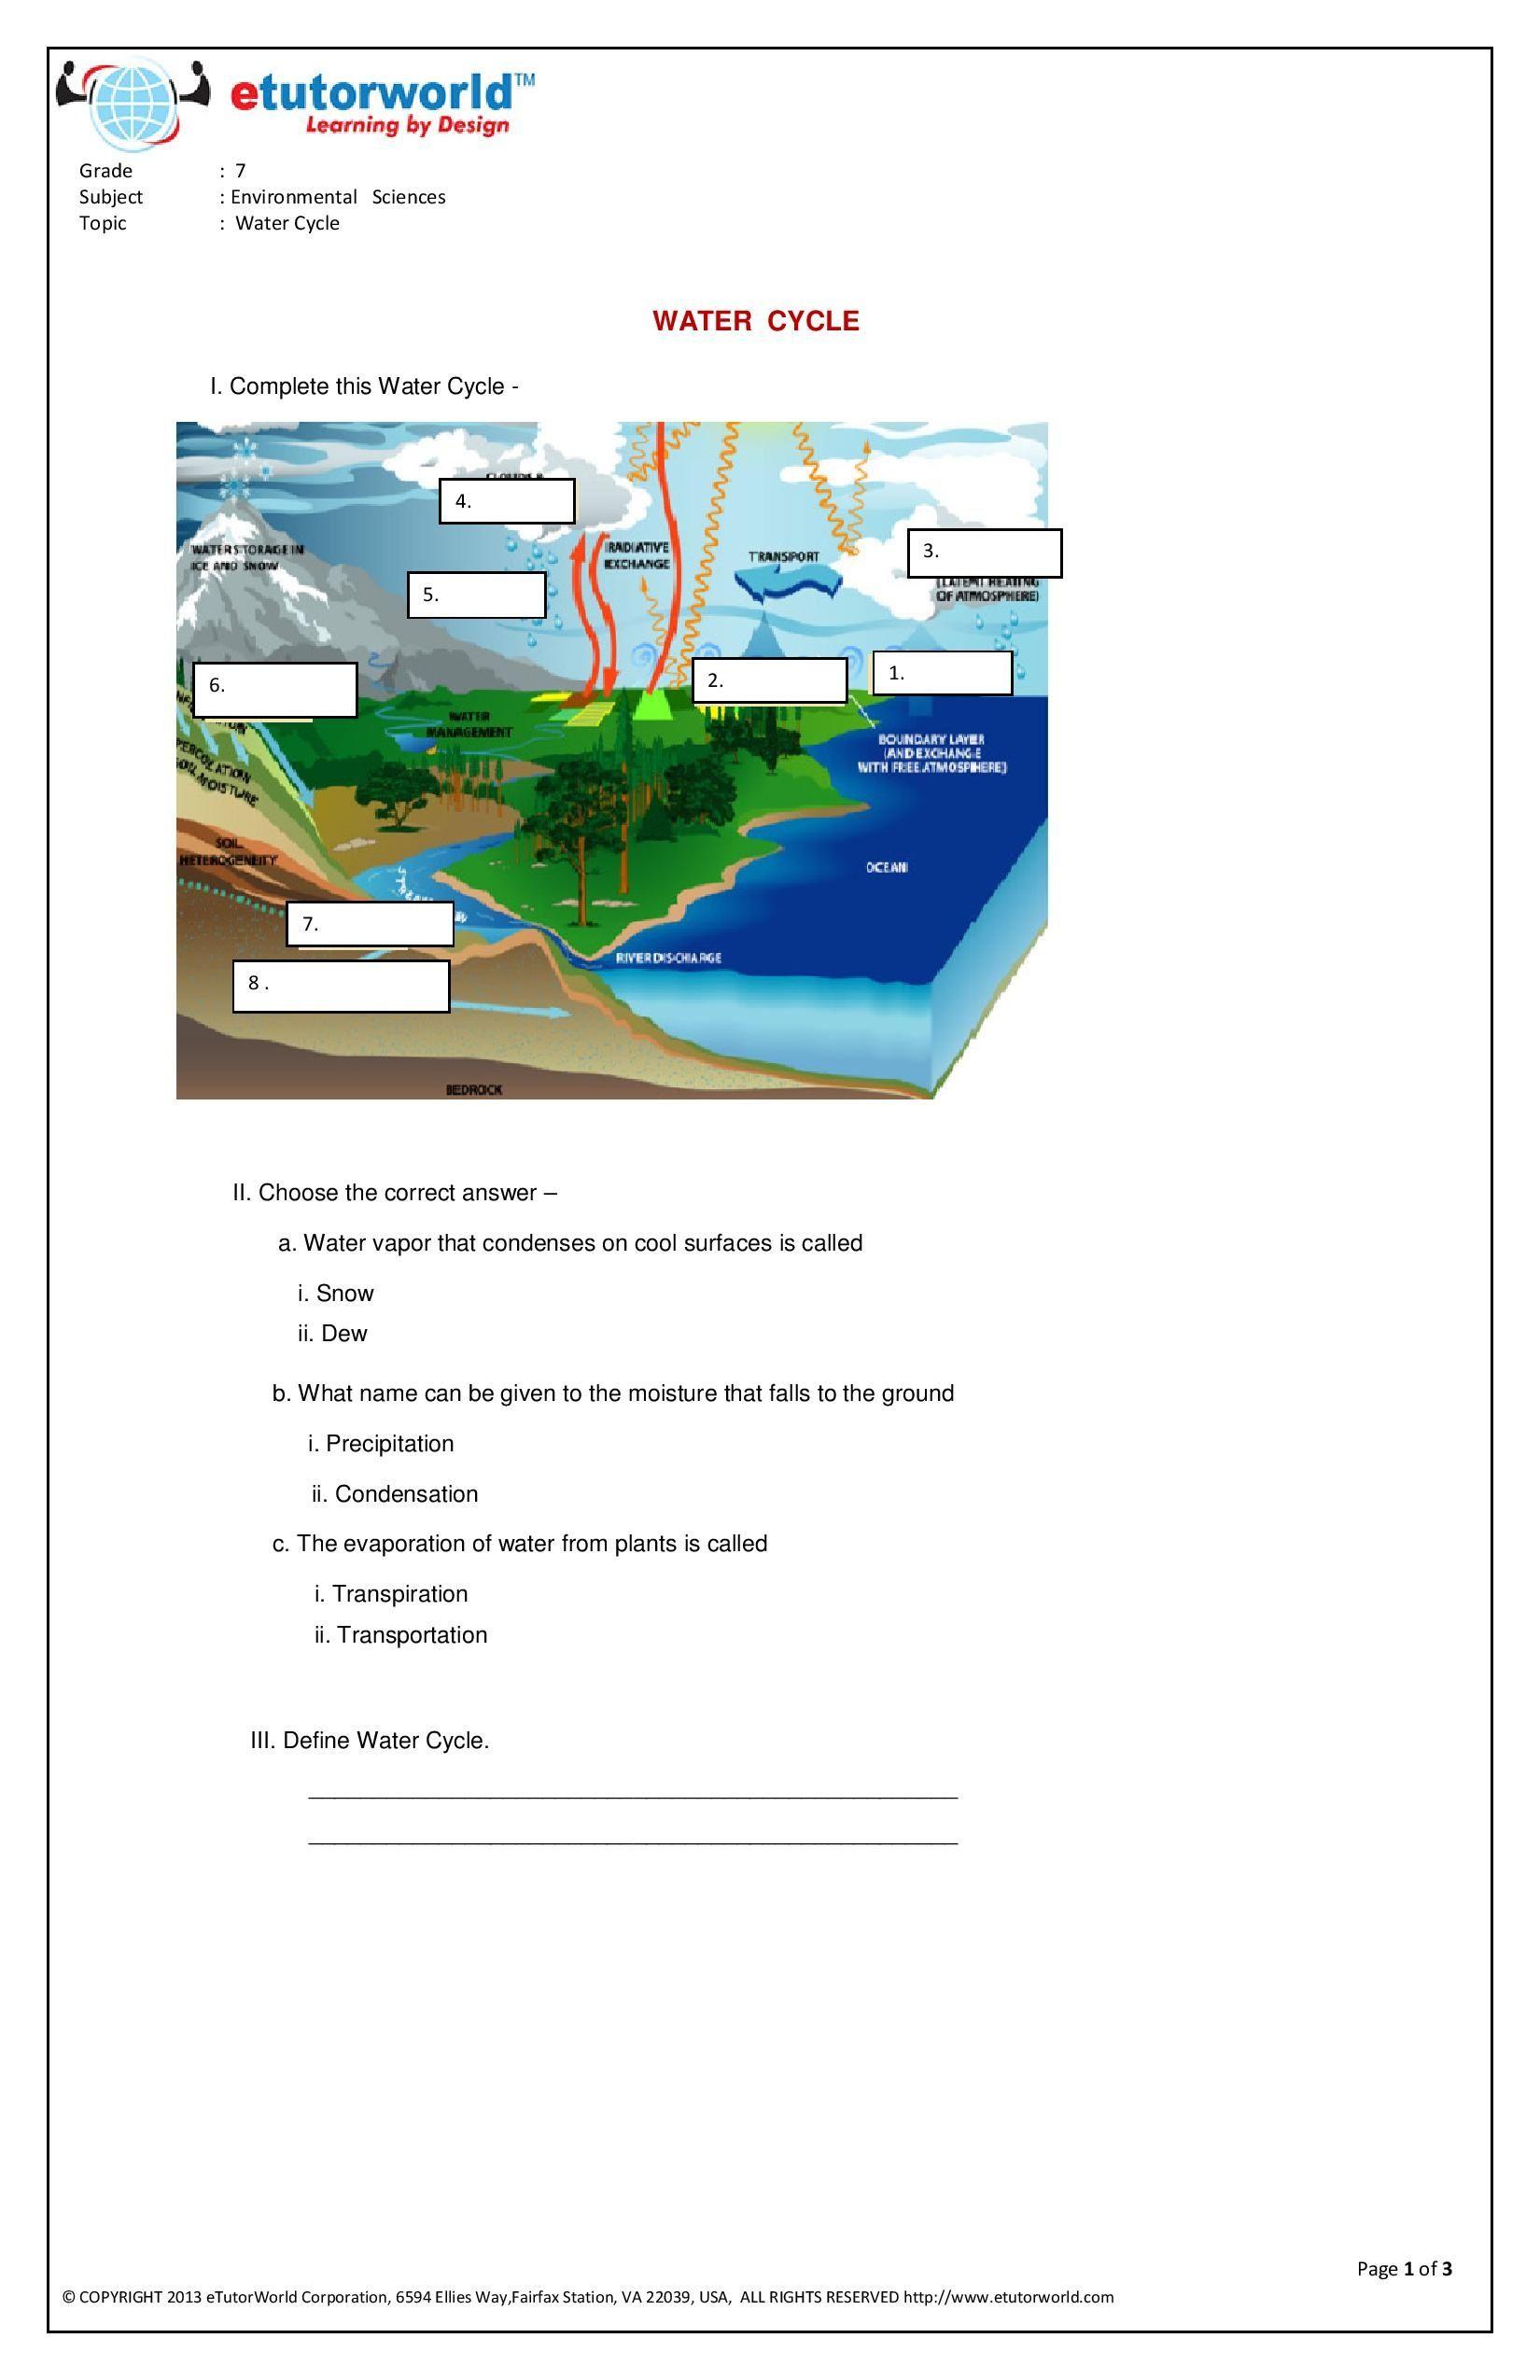 Pin By Etutorworld Inc On Grade 7 Science Worksheets